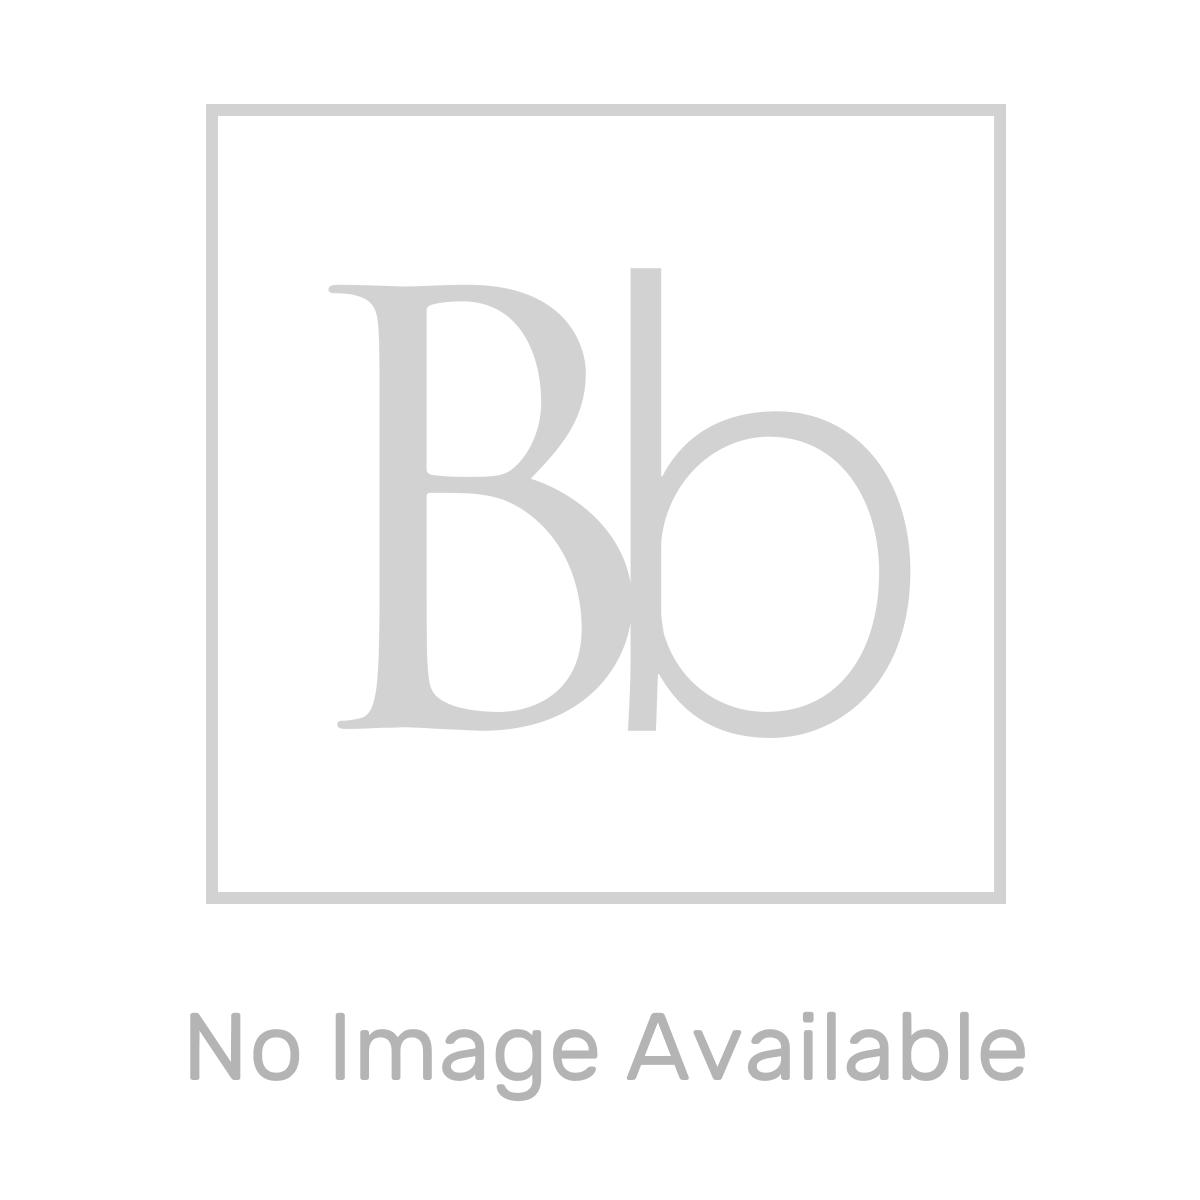 RAK Gloss White Urinal Partition Panel Measurements